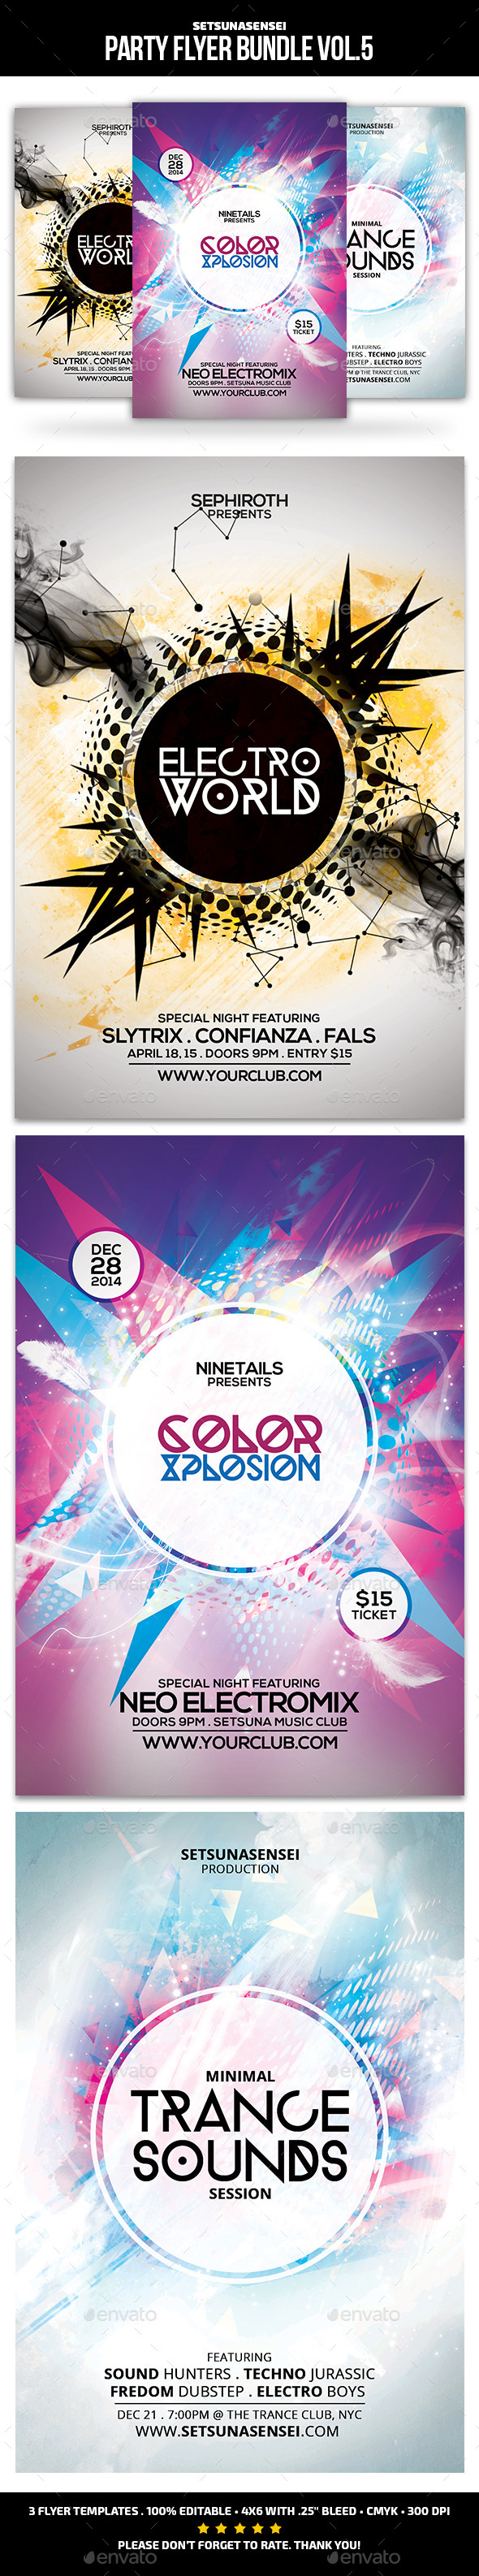 GraphicRiver Party Flyer Bundle Vol.5 9903192